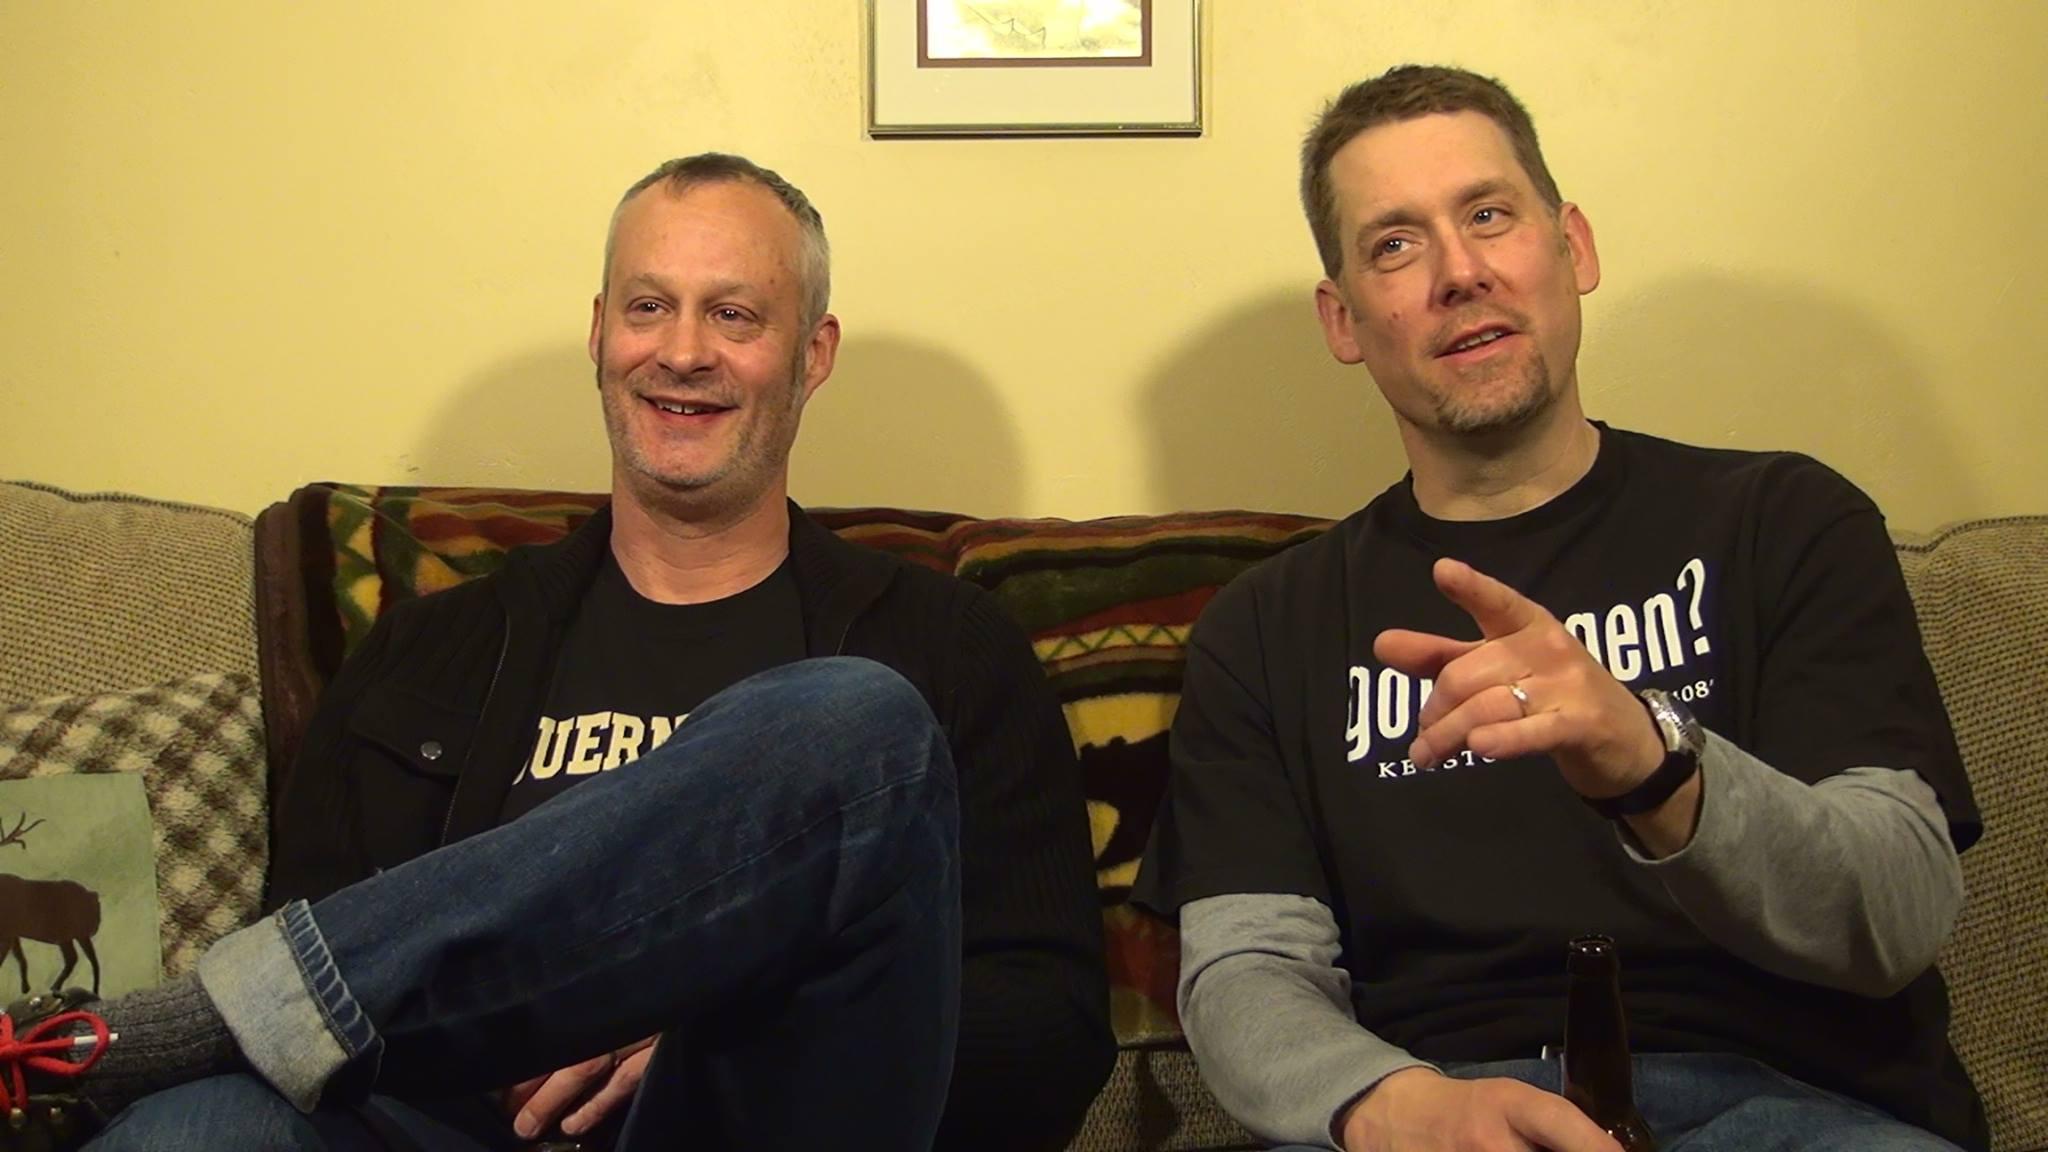 Steve & Jeff Fay (No Response)